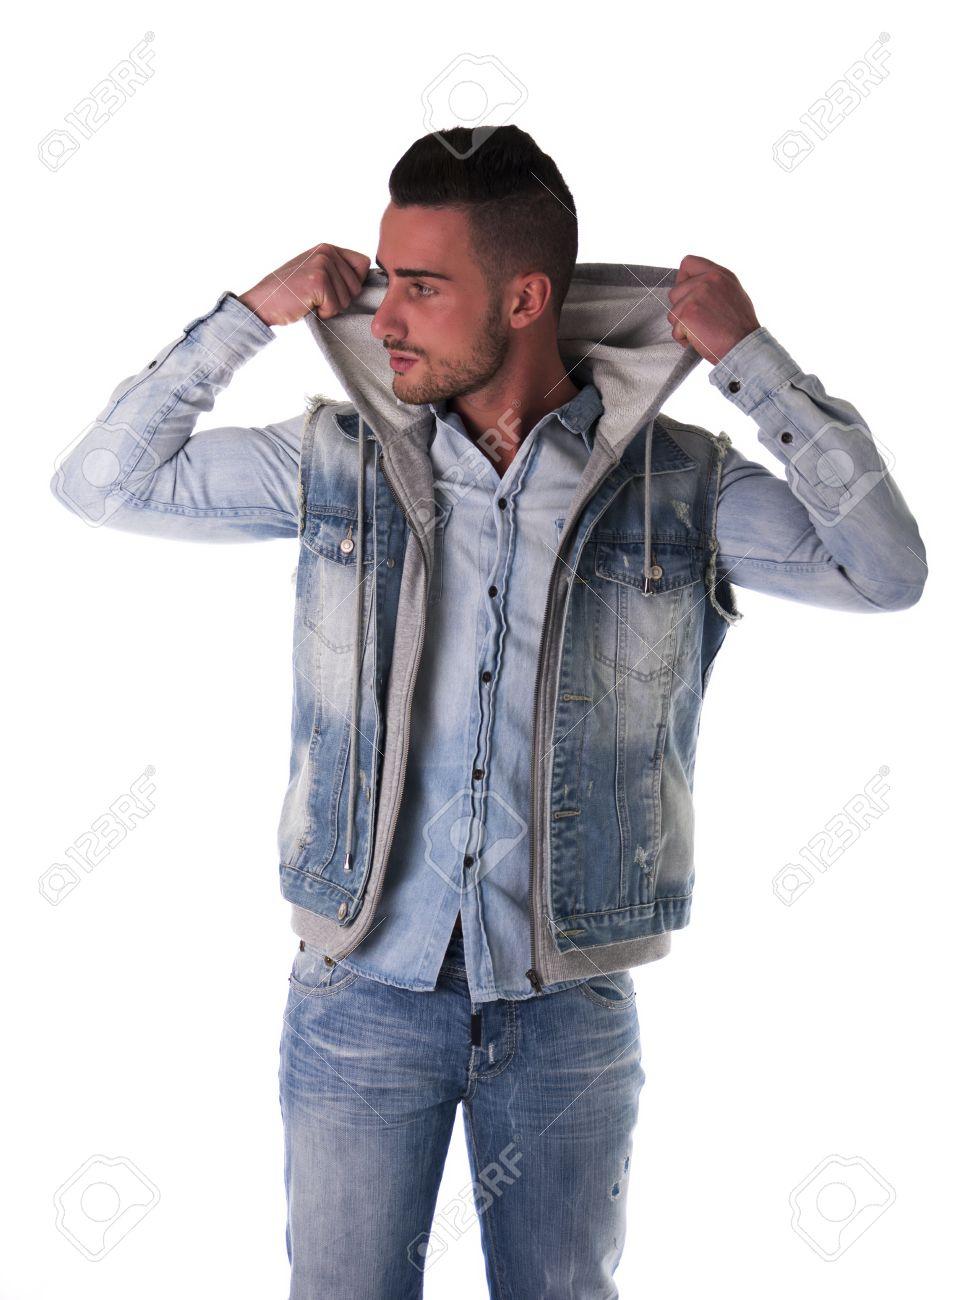 Kostuumvest Op Jeans.Knappe Jonge Man In Hoodie Denim Vest En Jeans Geisoleerd Op Wit